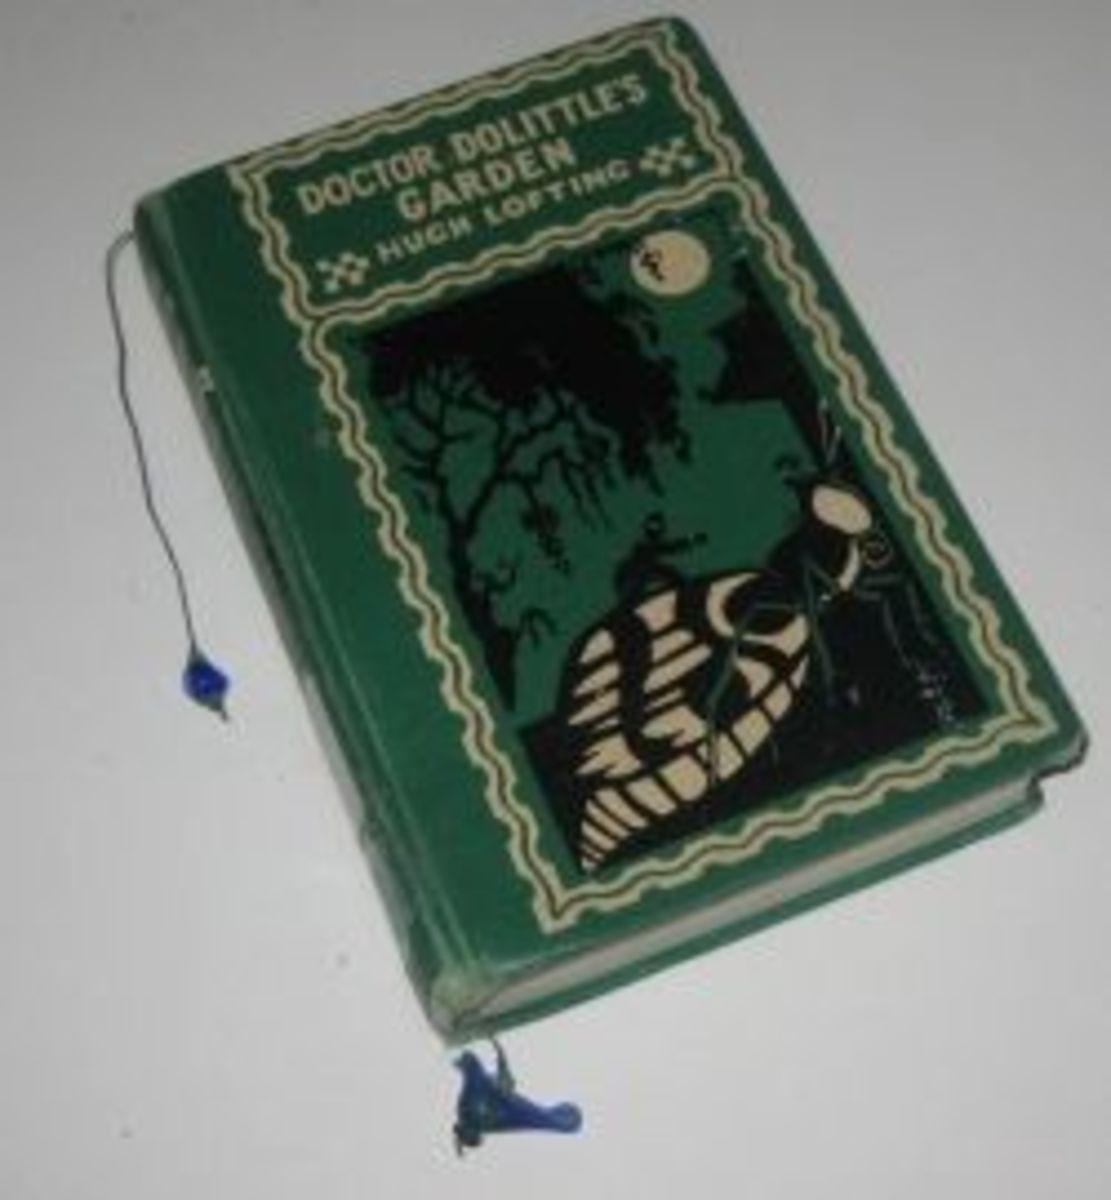 Sell rare books on Amazon.